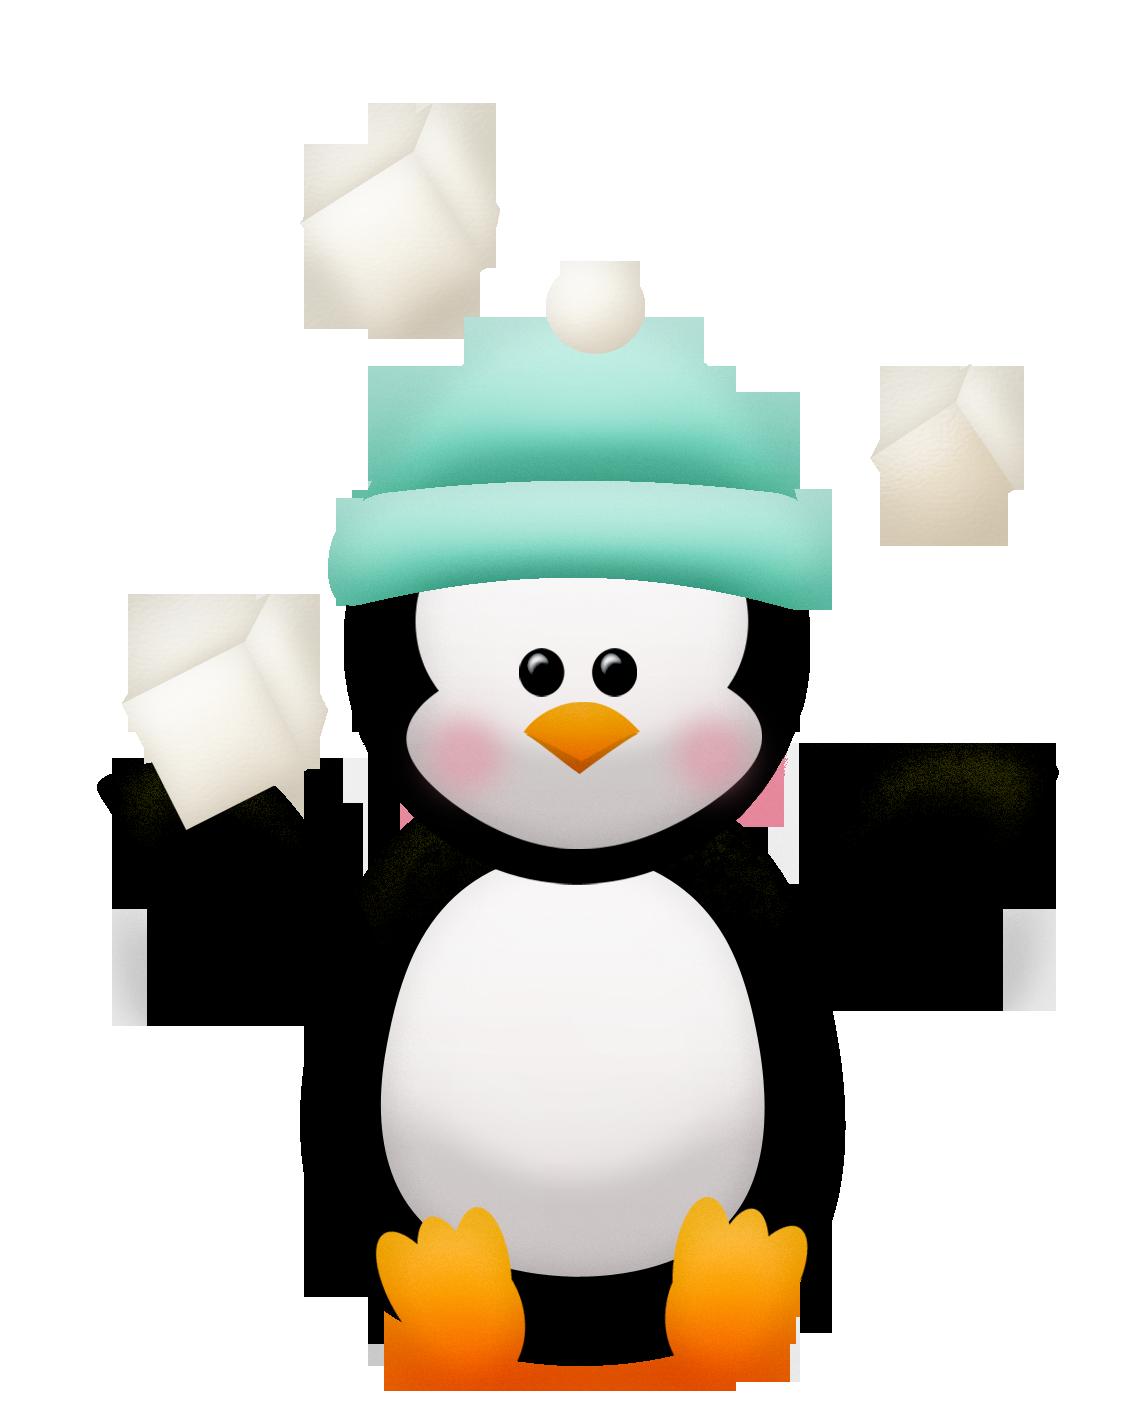 Snowball clipart winter carnival. Photo by selmabuenoaltran minus